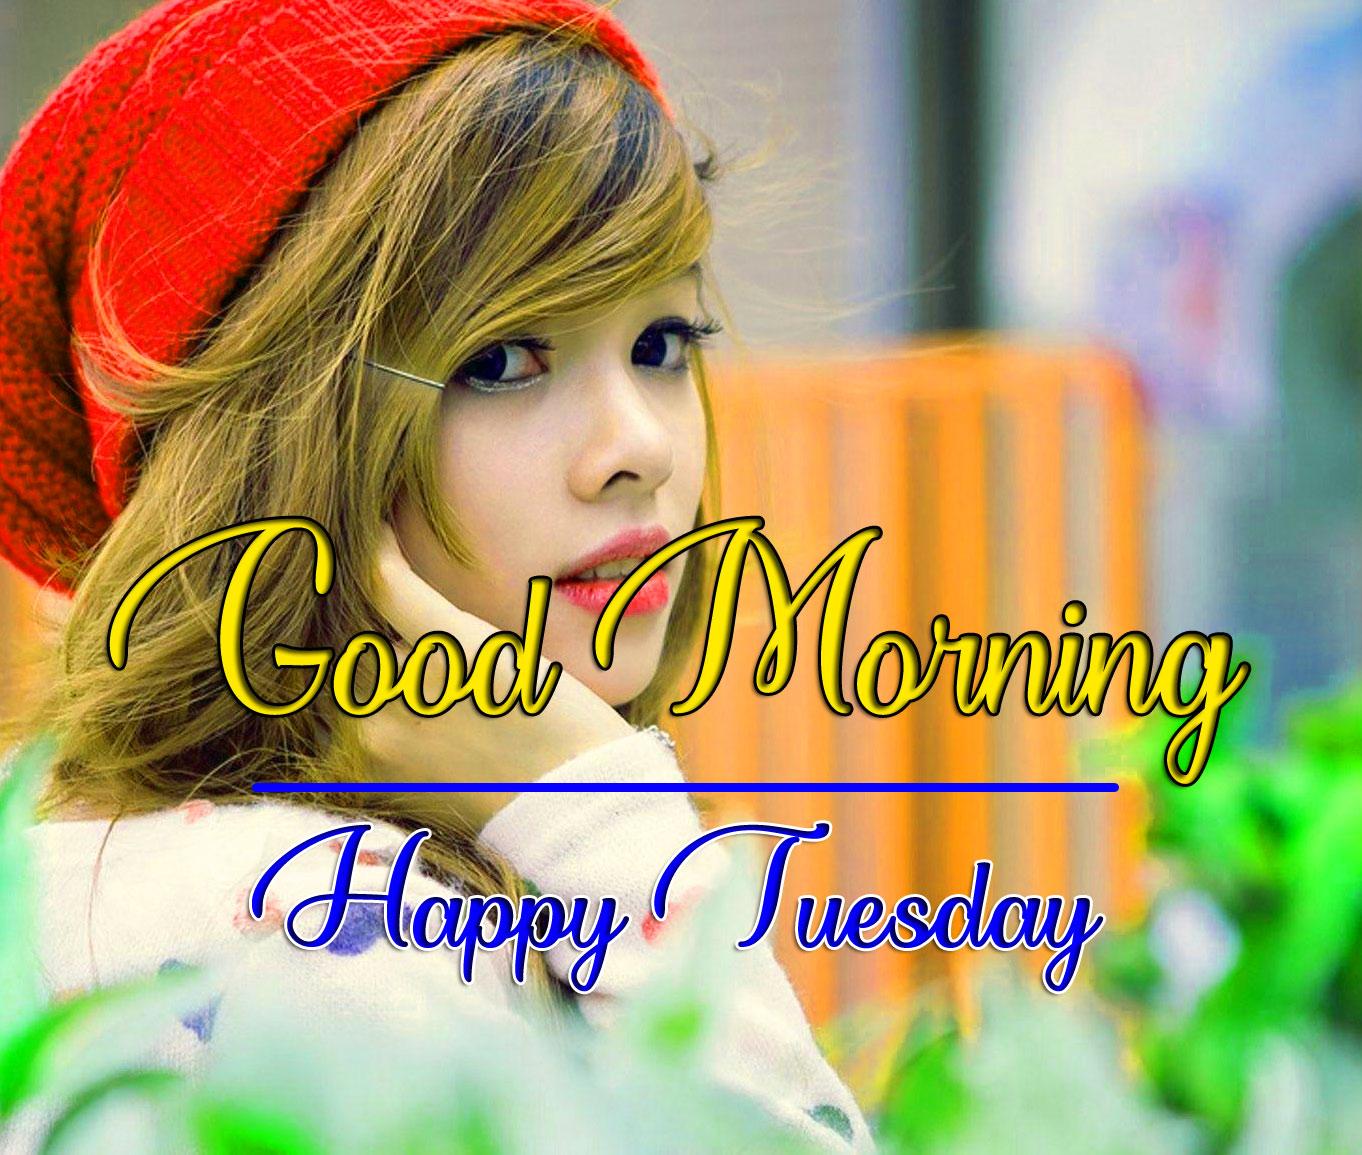 Girls Free Beautiful Tuesday Good morning Images